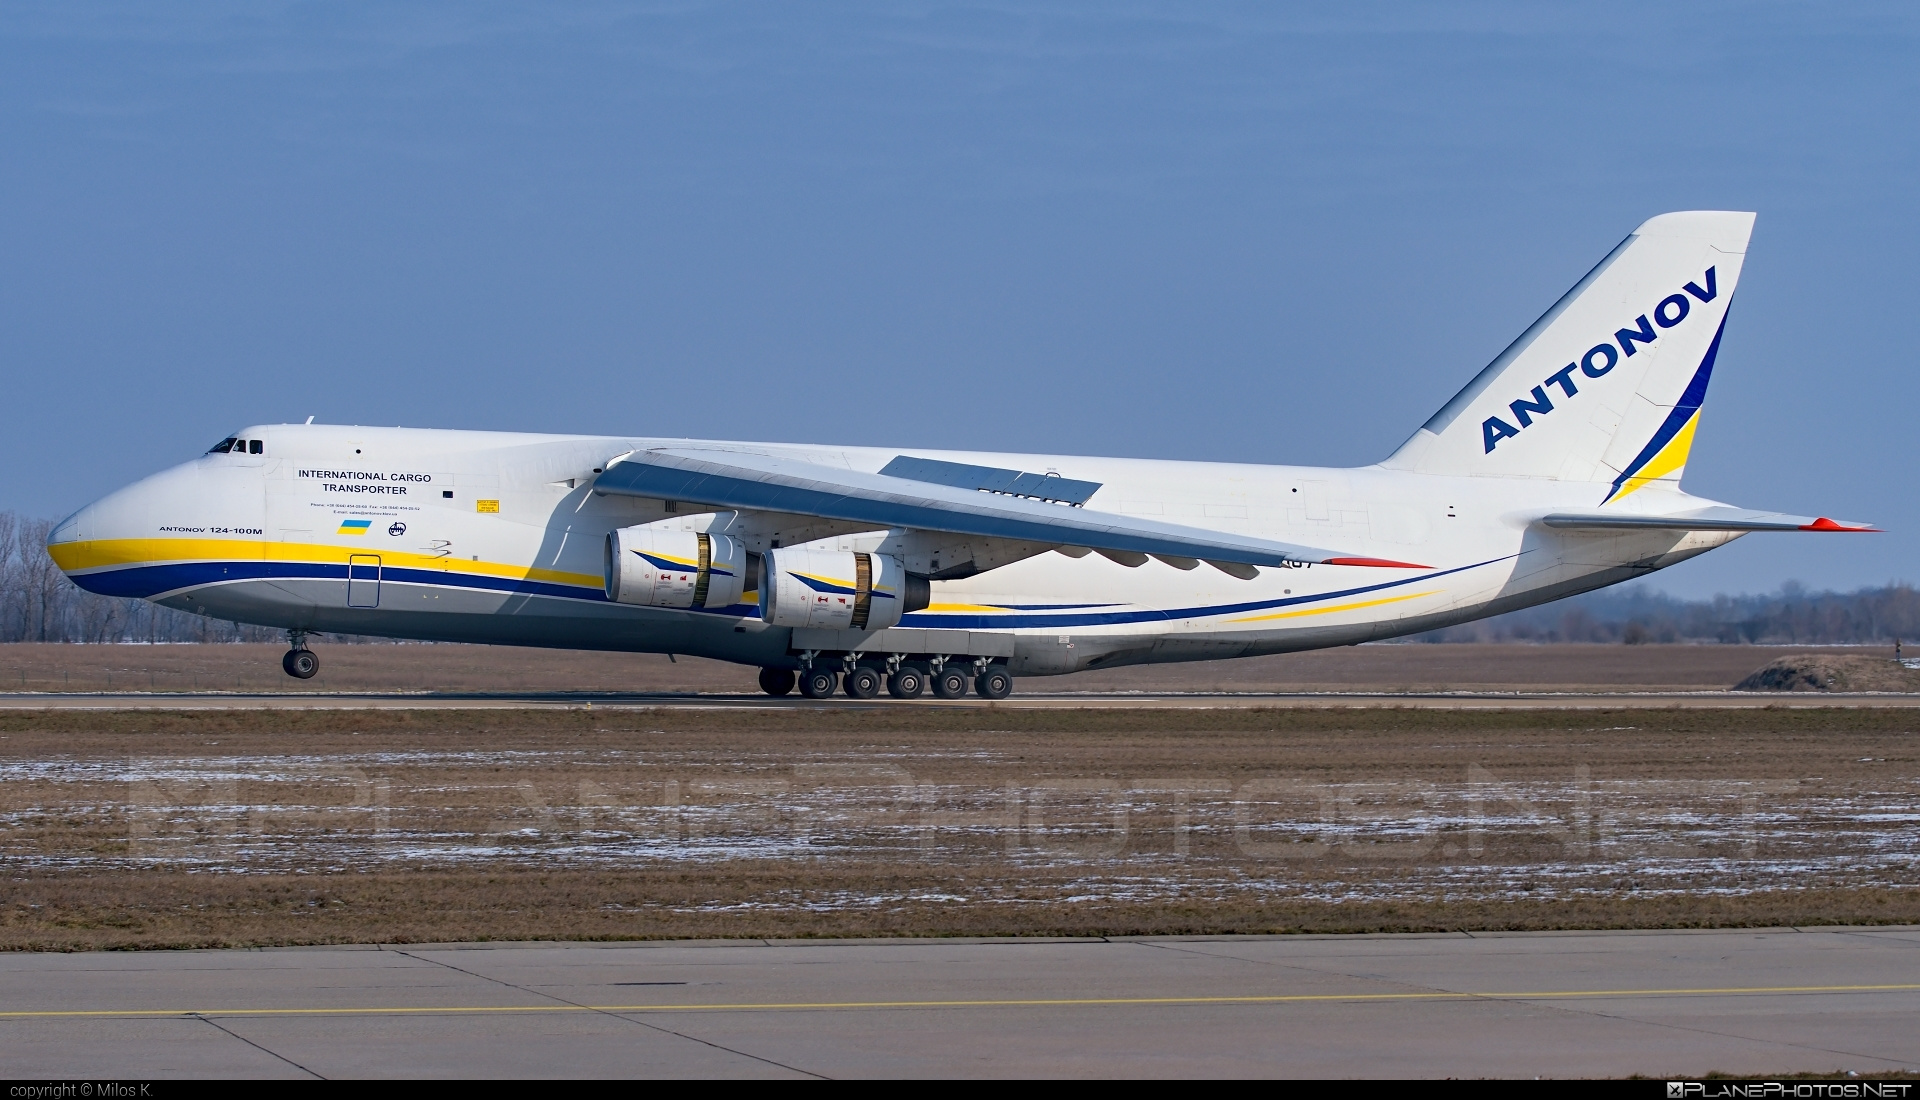 Antonov An-124-100M Ruslan - UR-82007 operated by Antonov Airlines #an124 #an124100m #an124100mruslan #an124ruslan #antonov #antonov124 #antonovan124